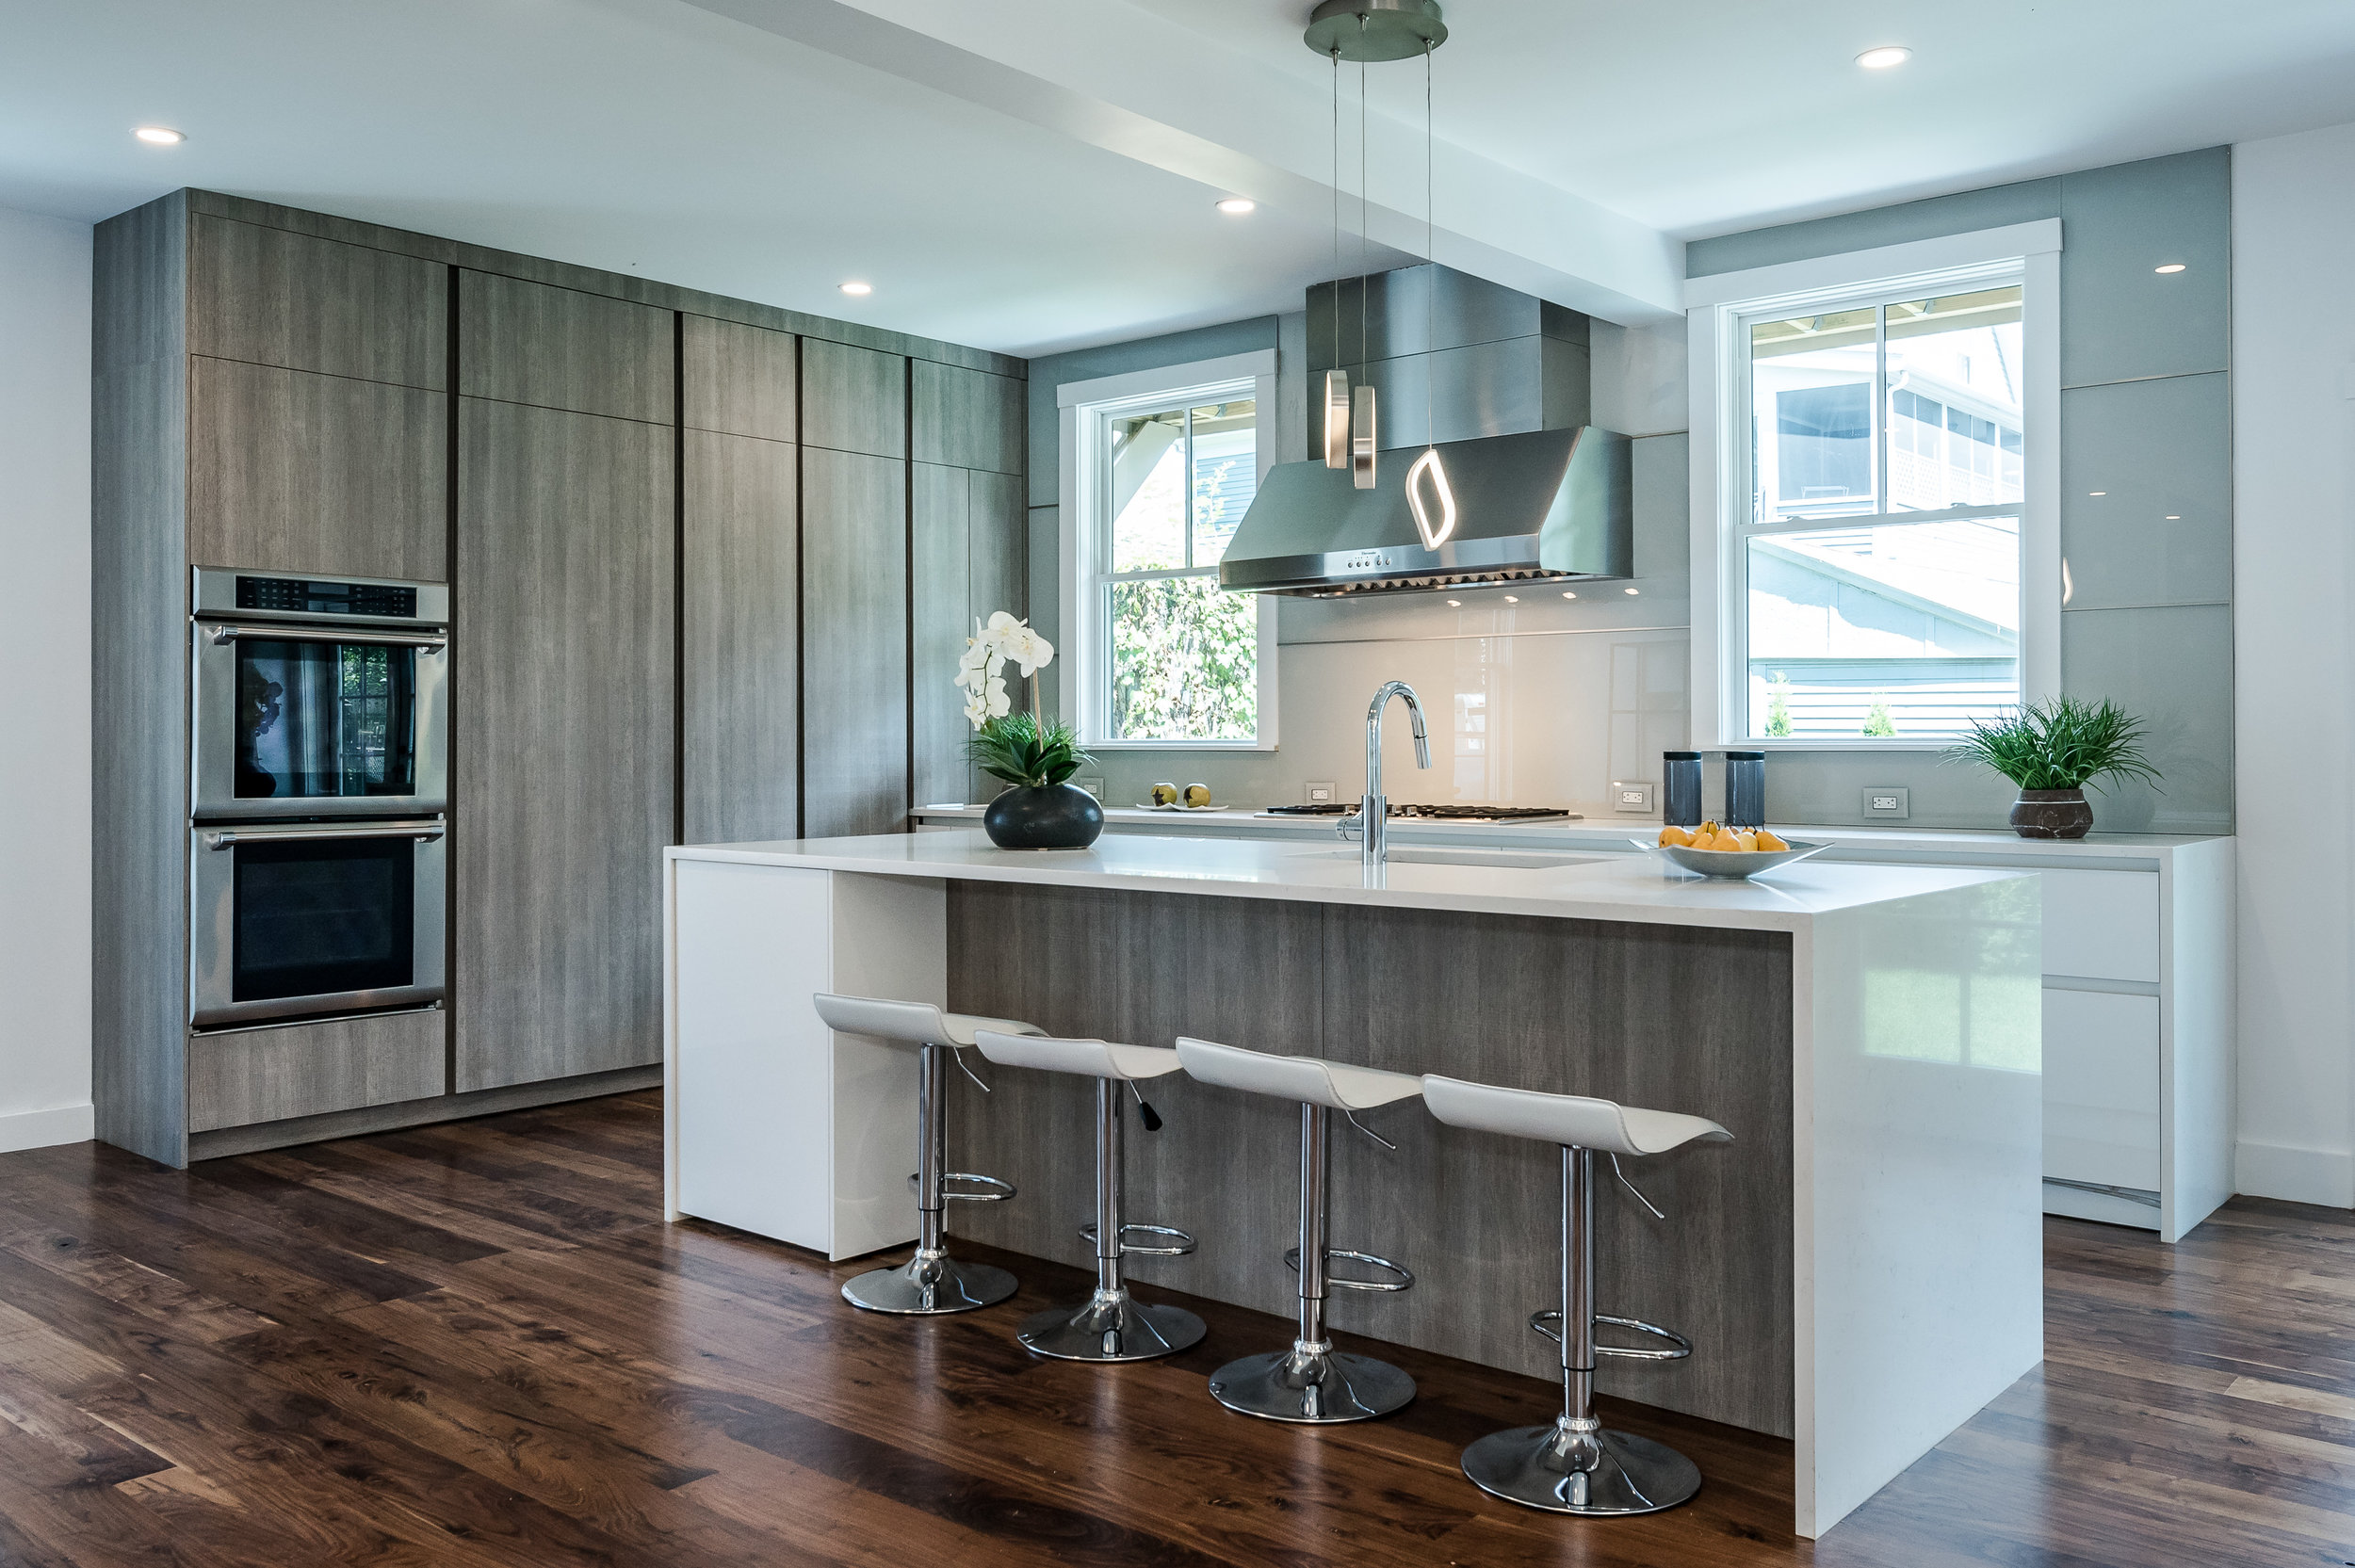 brookline-contemporary-kitchen-dutch-colonial (3).jpg